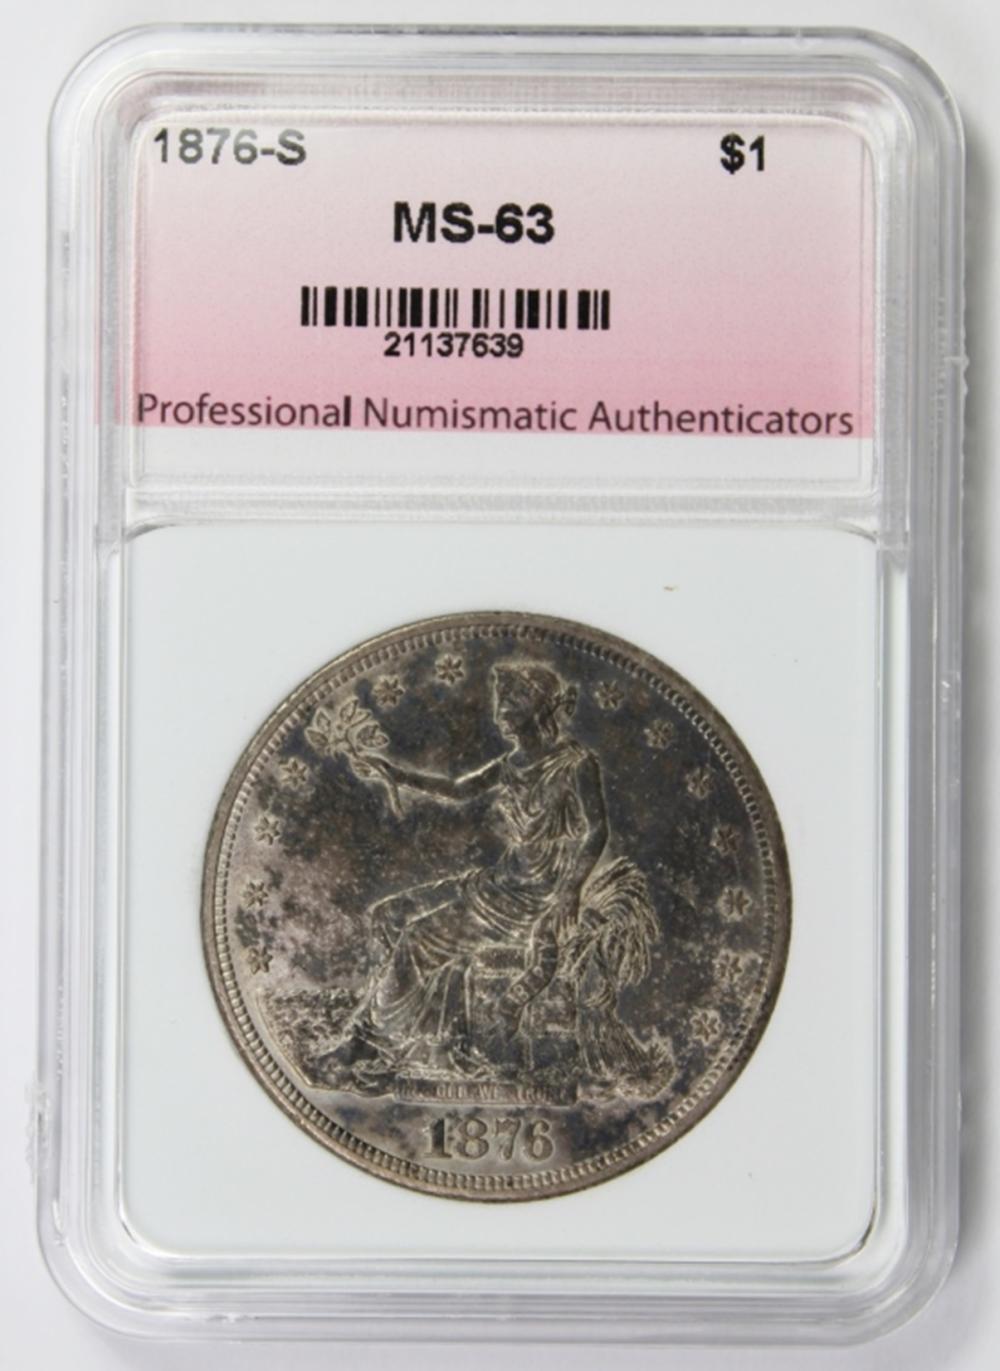 Lot 248: 1876-S TRADE DOLLAR